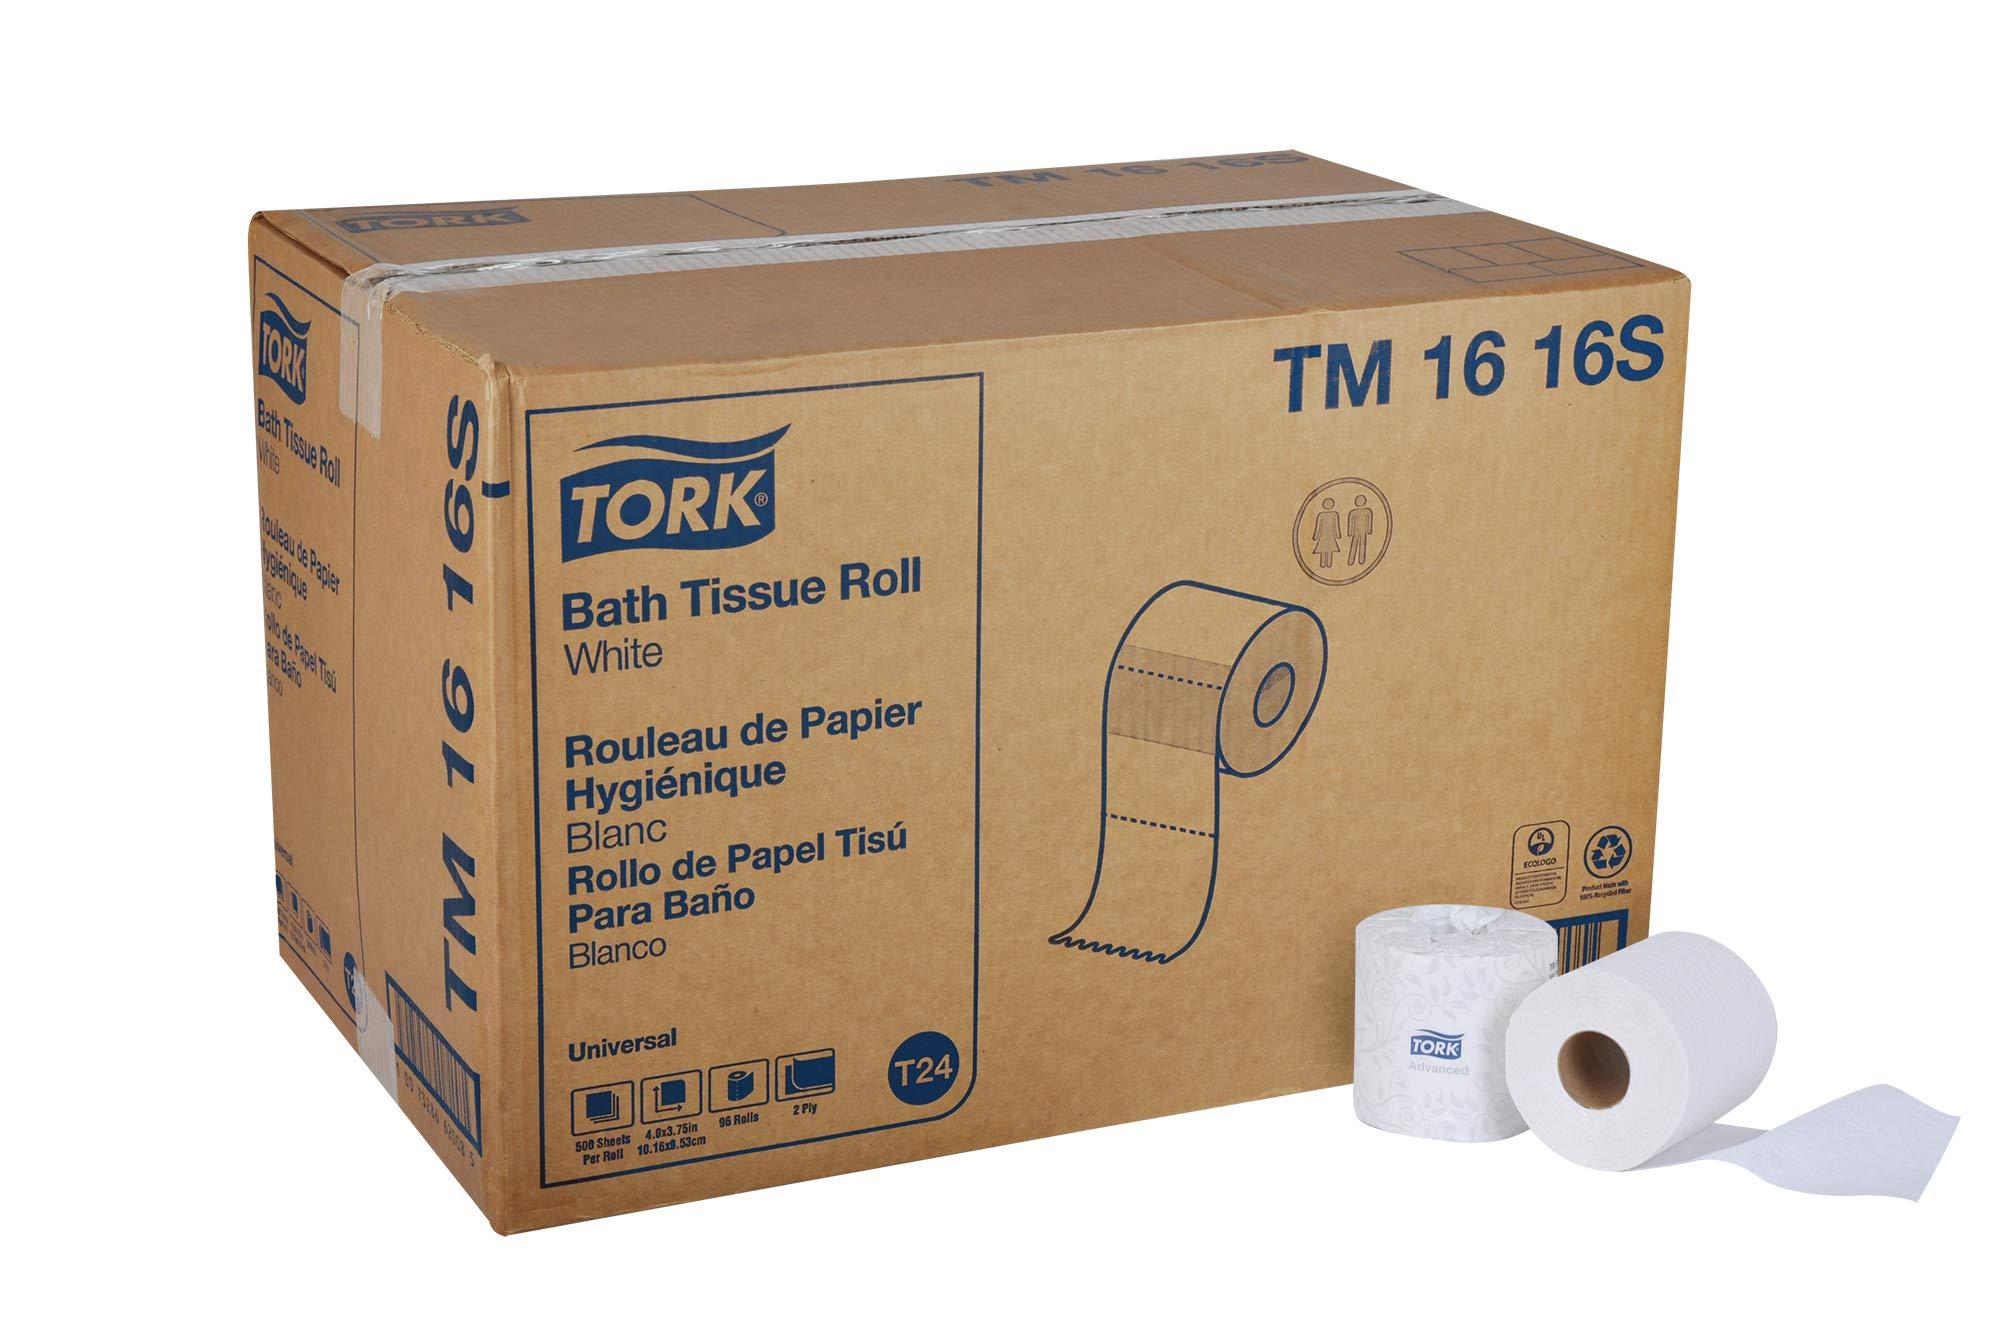 Tork Universal TM1616S Bath Tissue Roll, 2-Ply, 4'' Width x 3.75'' Length, White (Case  of 96 Rolls, 500 per Roll, 48,000 Sheets) by Tork